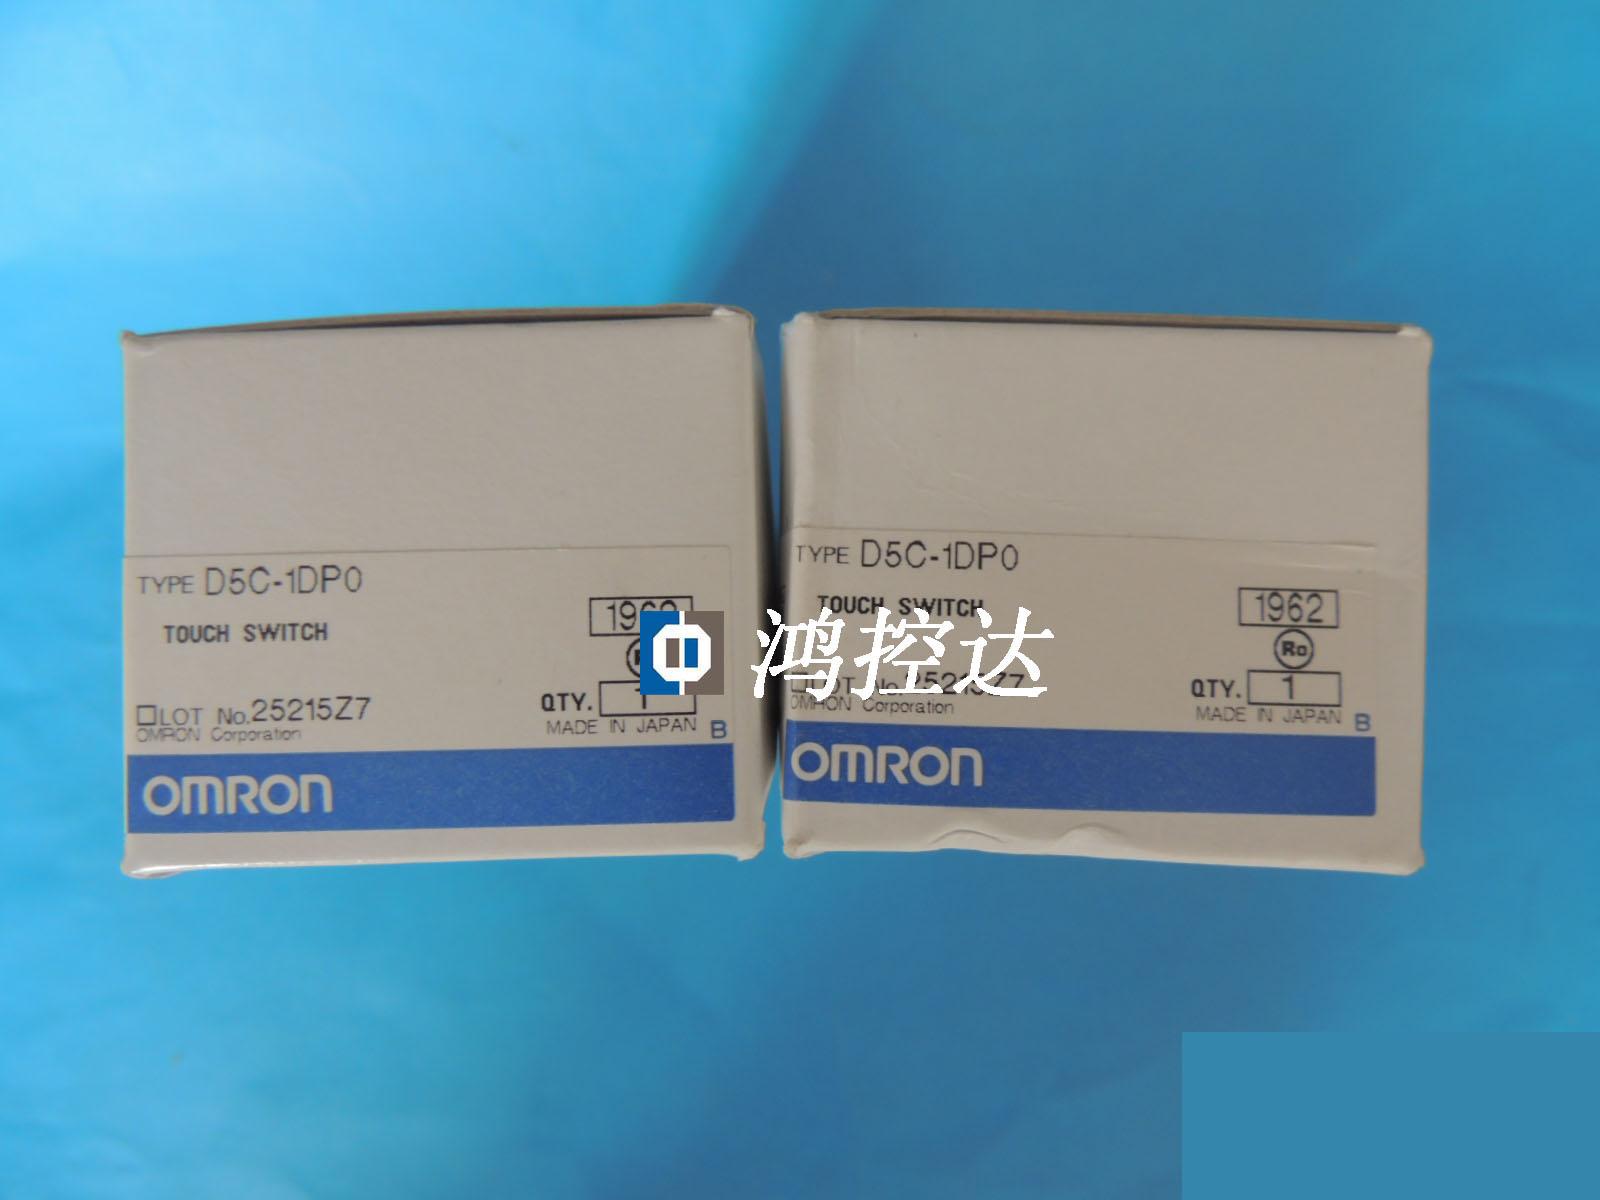 New Contact Switch D5C-1DP0/D5C-1DPONew Contact Switch D5C-1DP0/D5C-1DPO